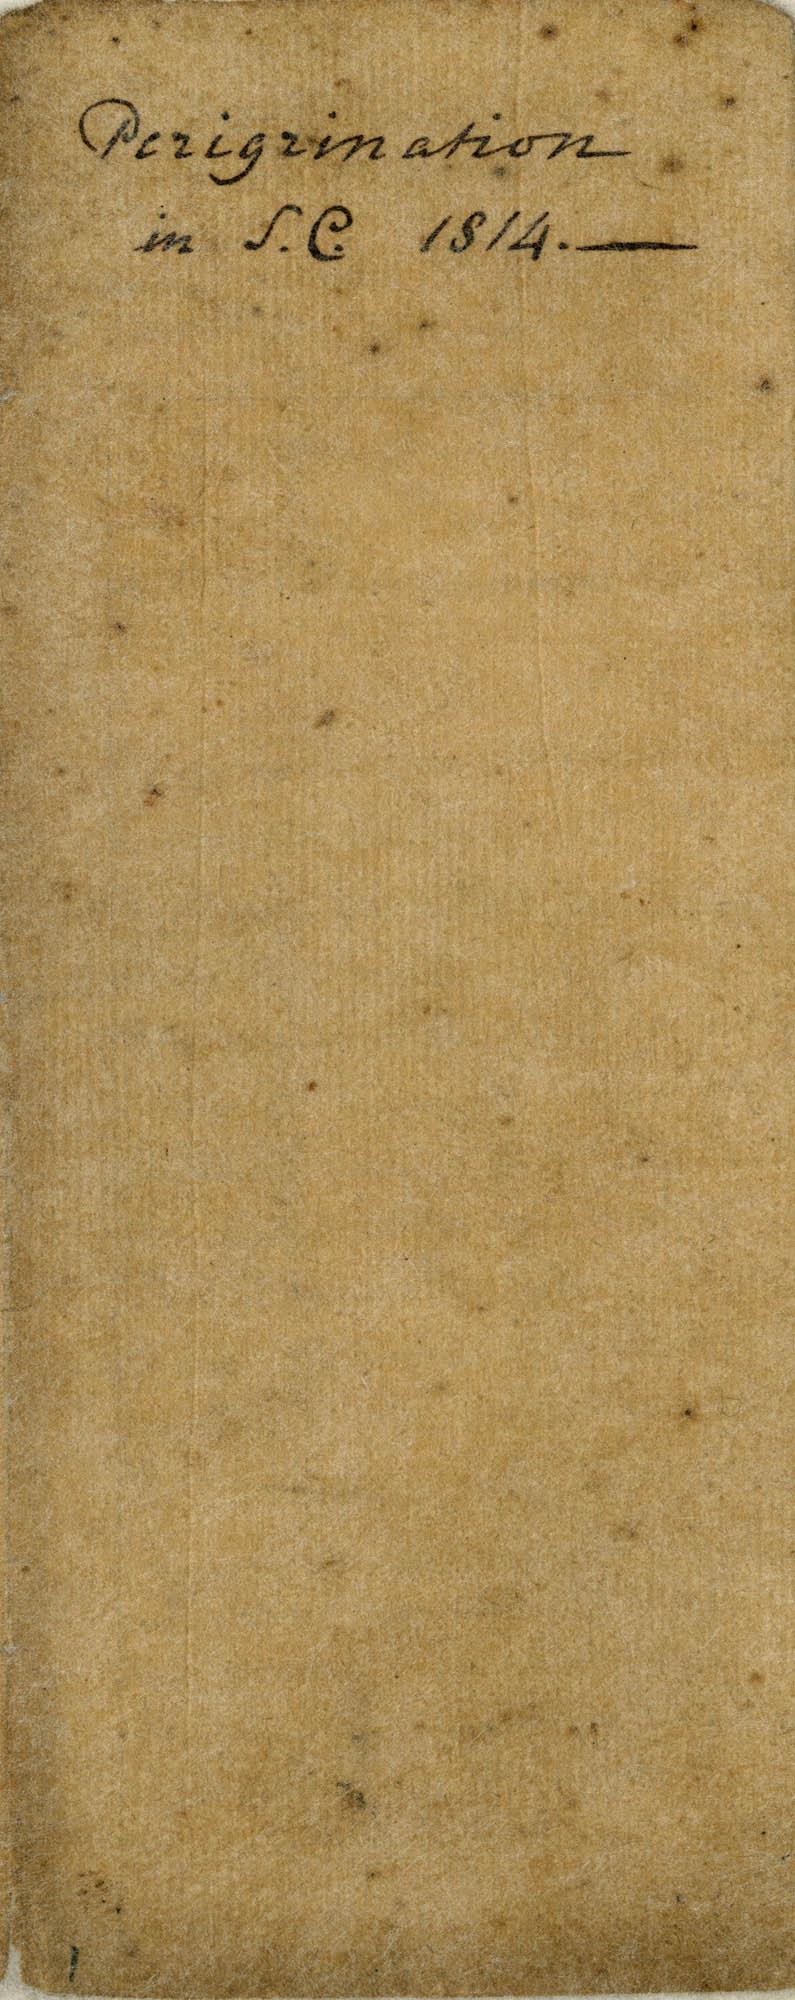 Diary of Charles Drayton, 1814